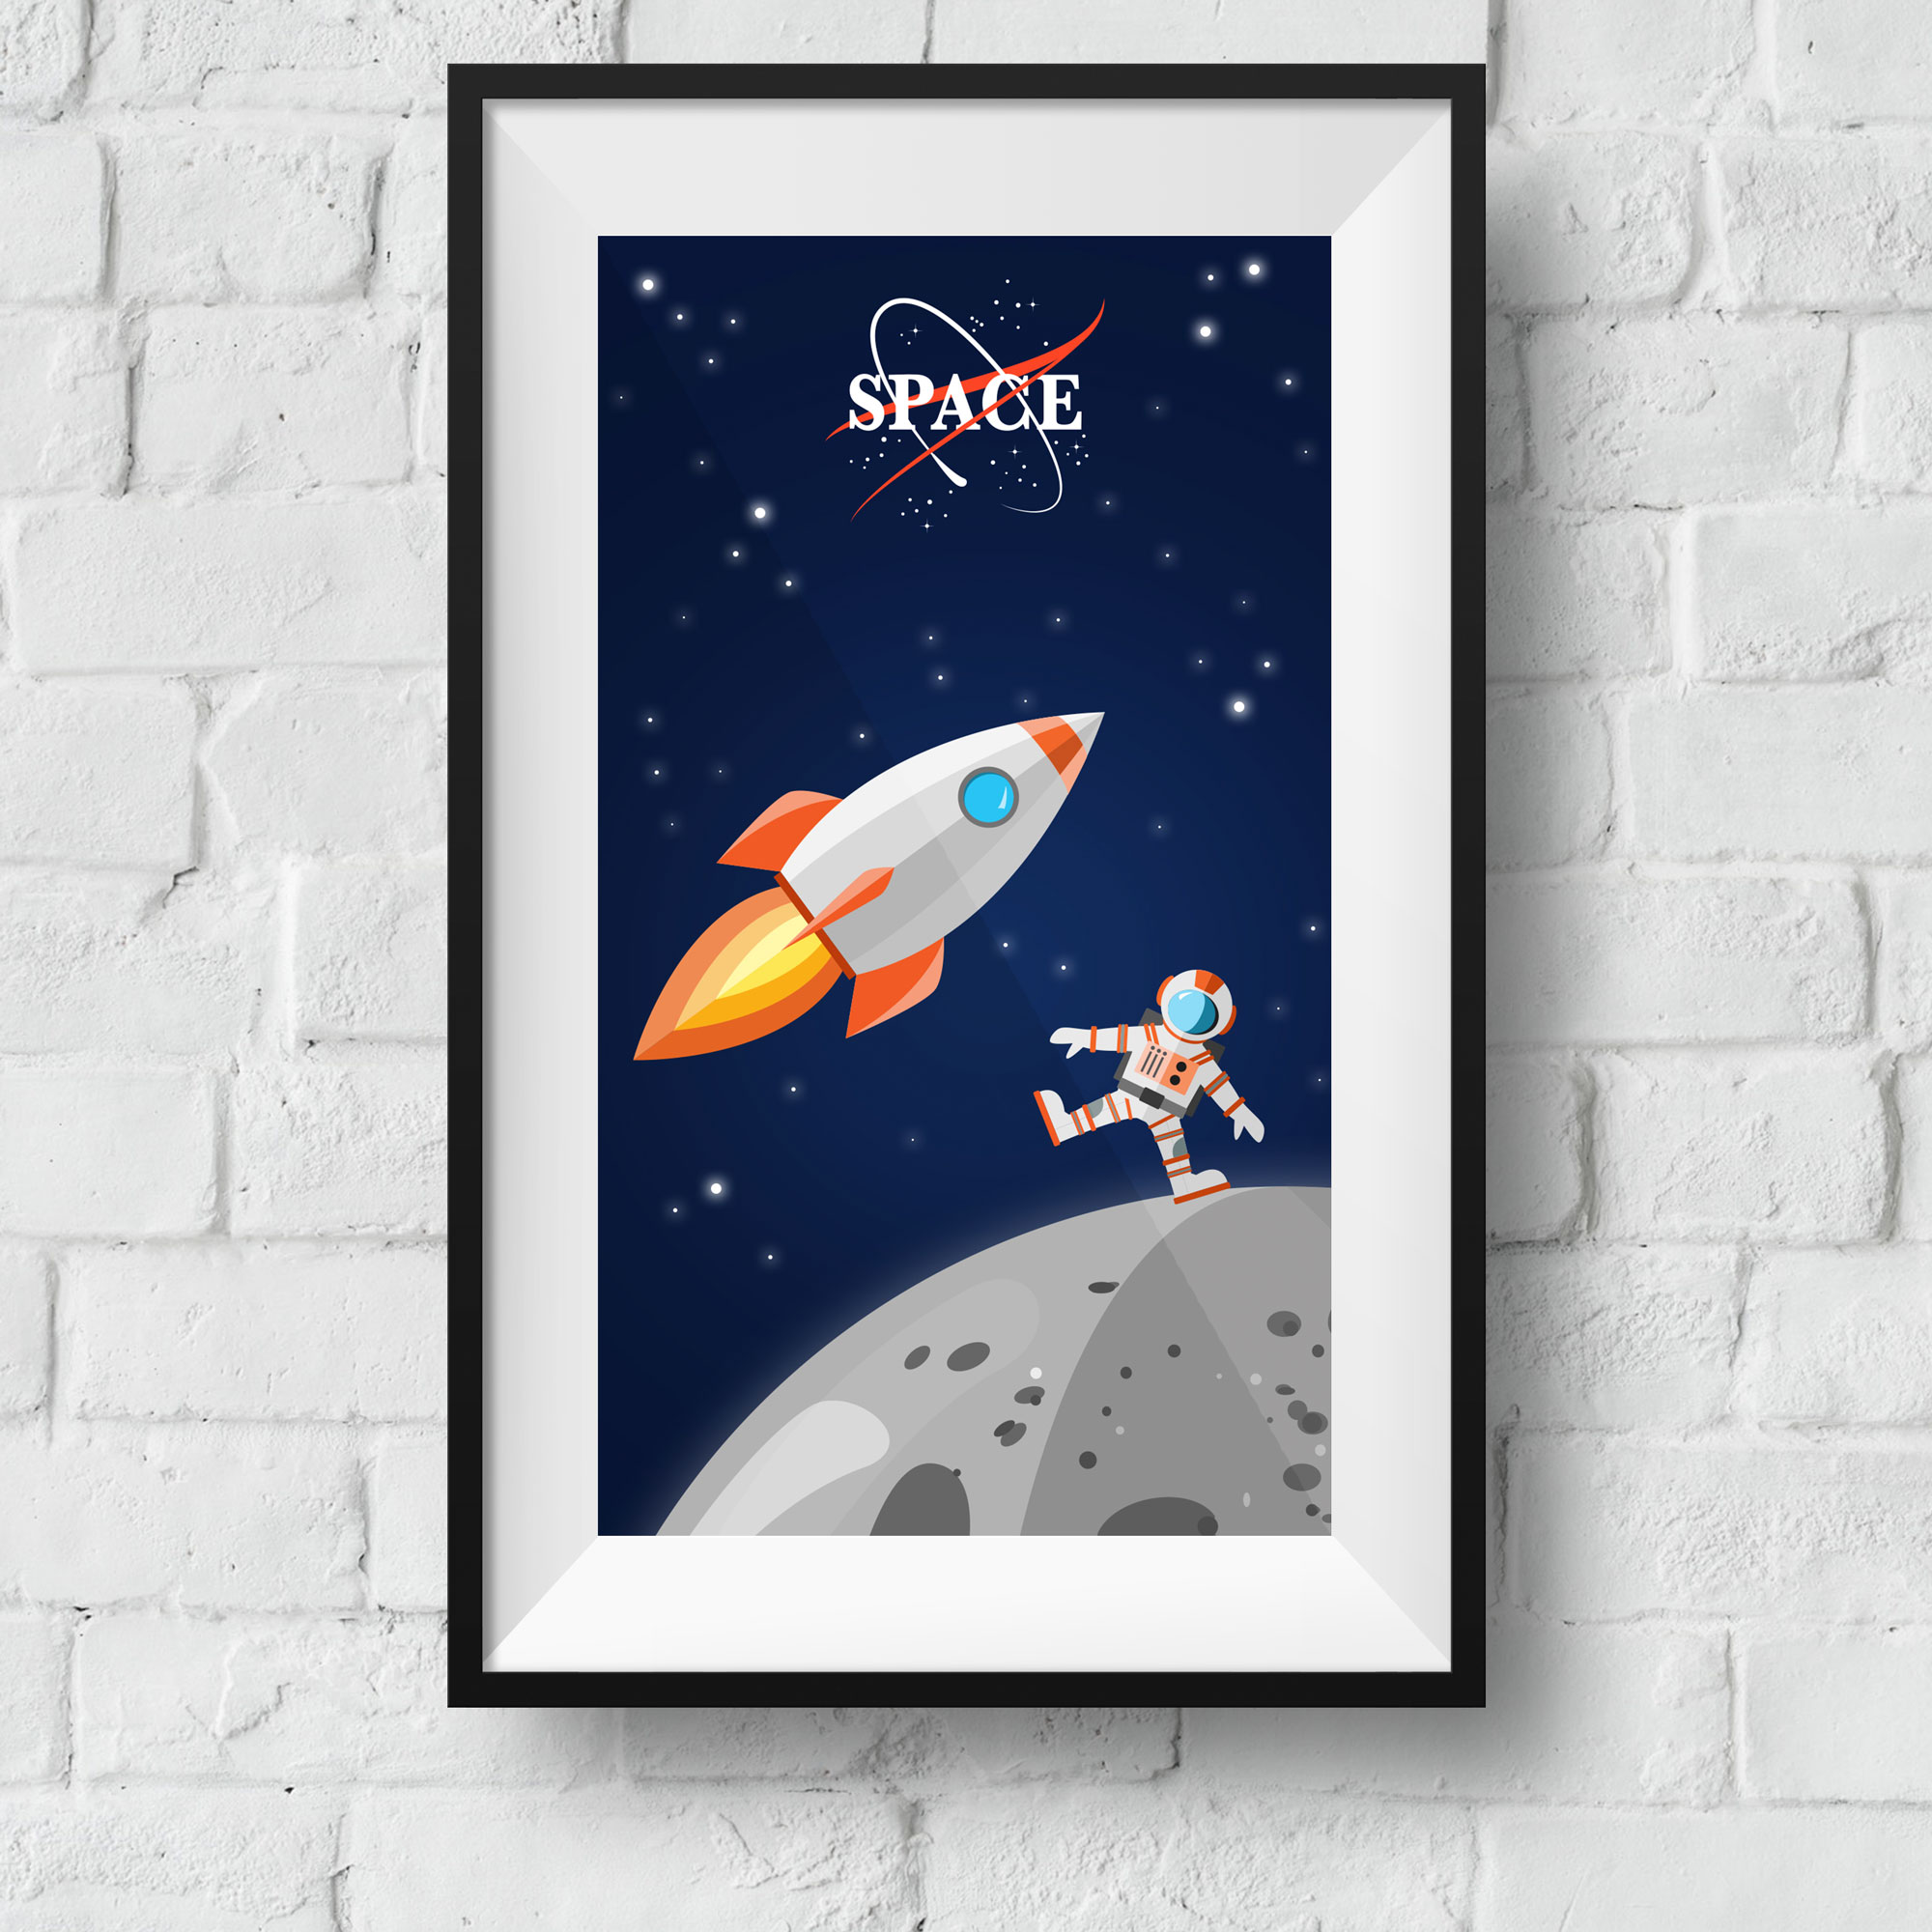 space-framed